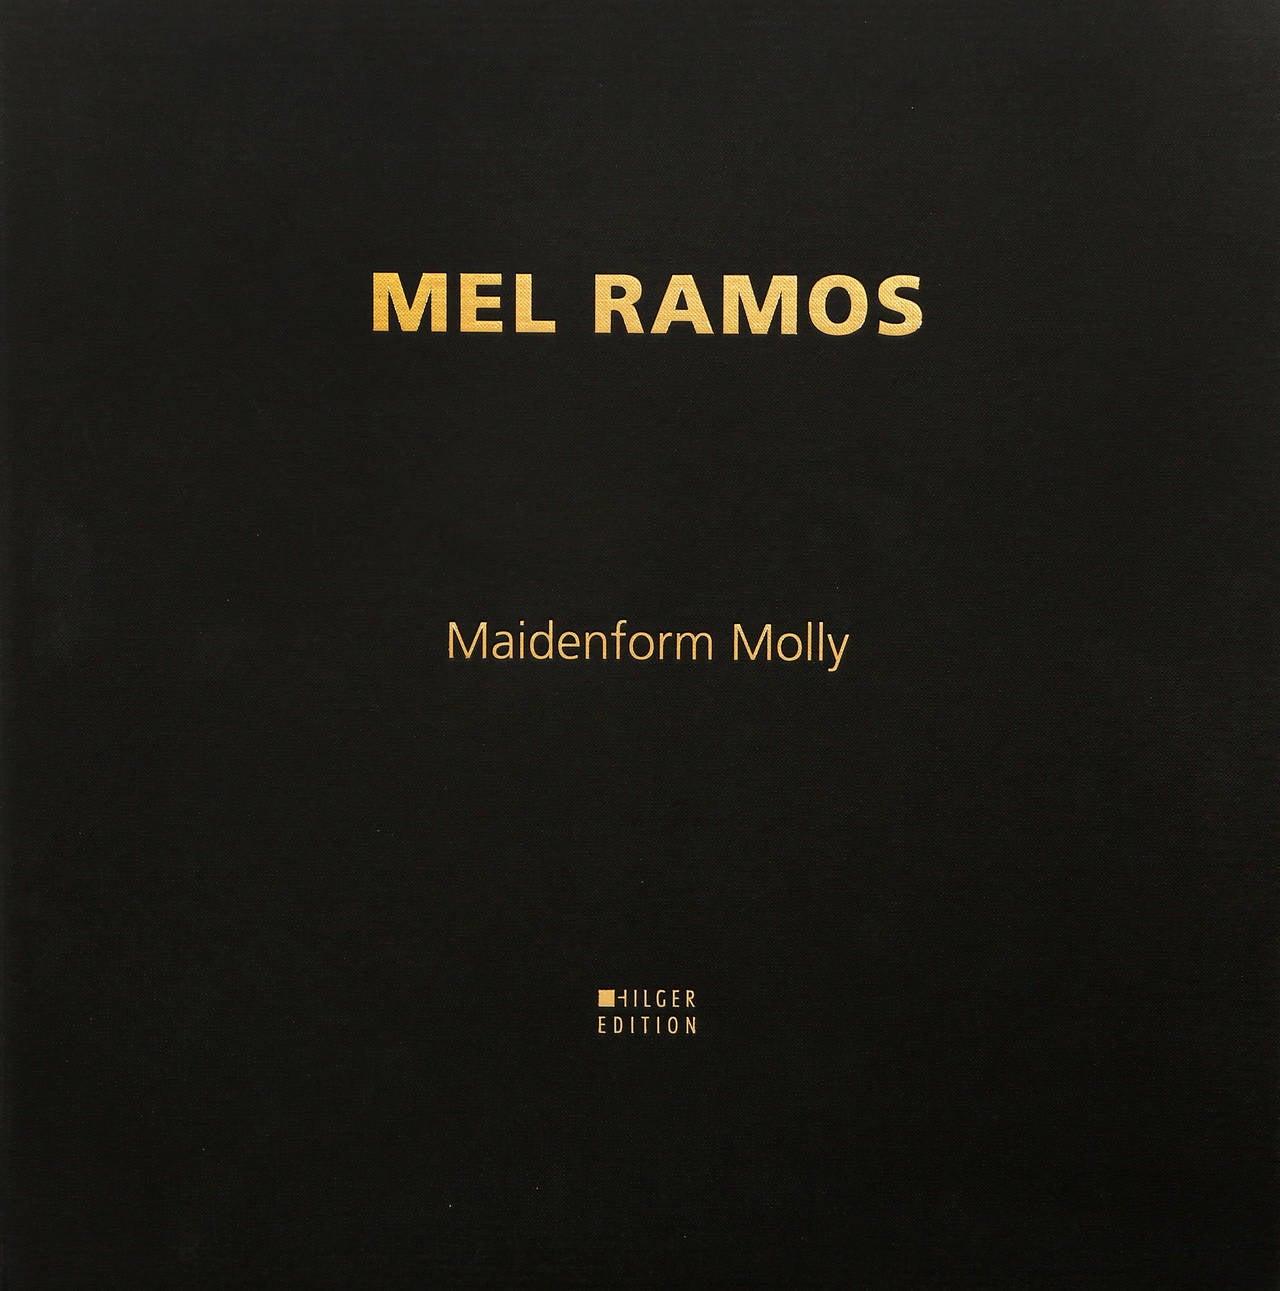 Maidenform Molly - Pop Art Print by Mel Ramos